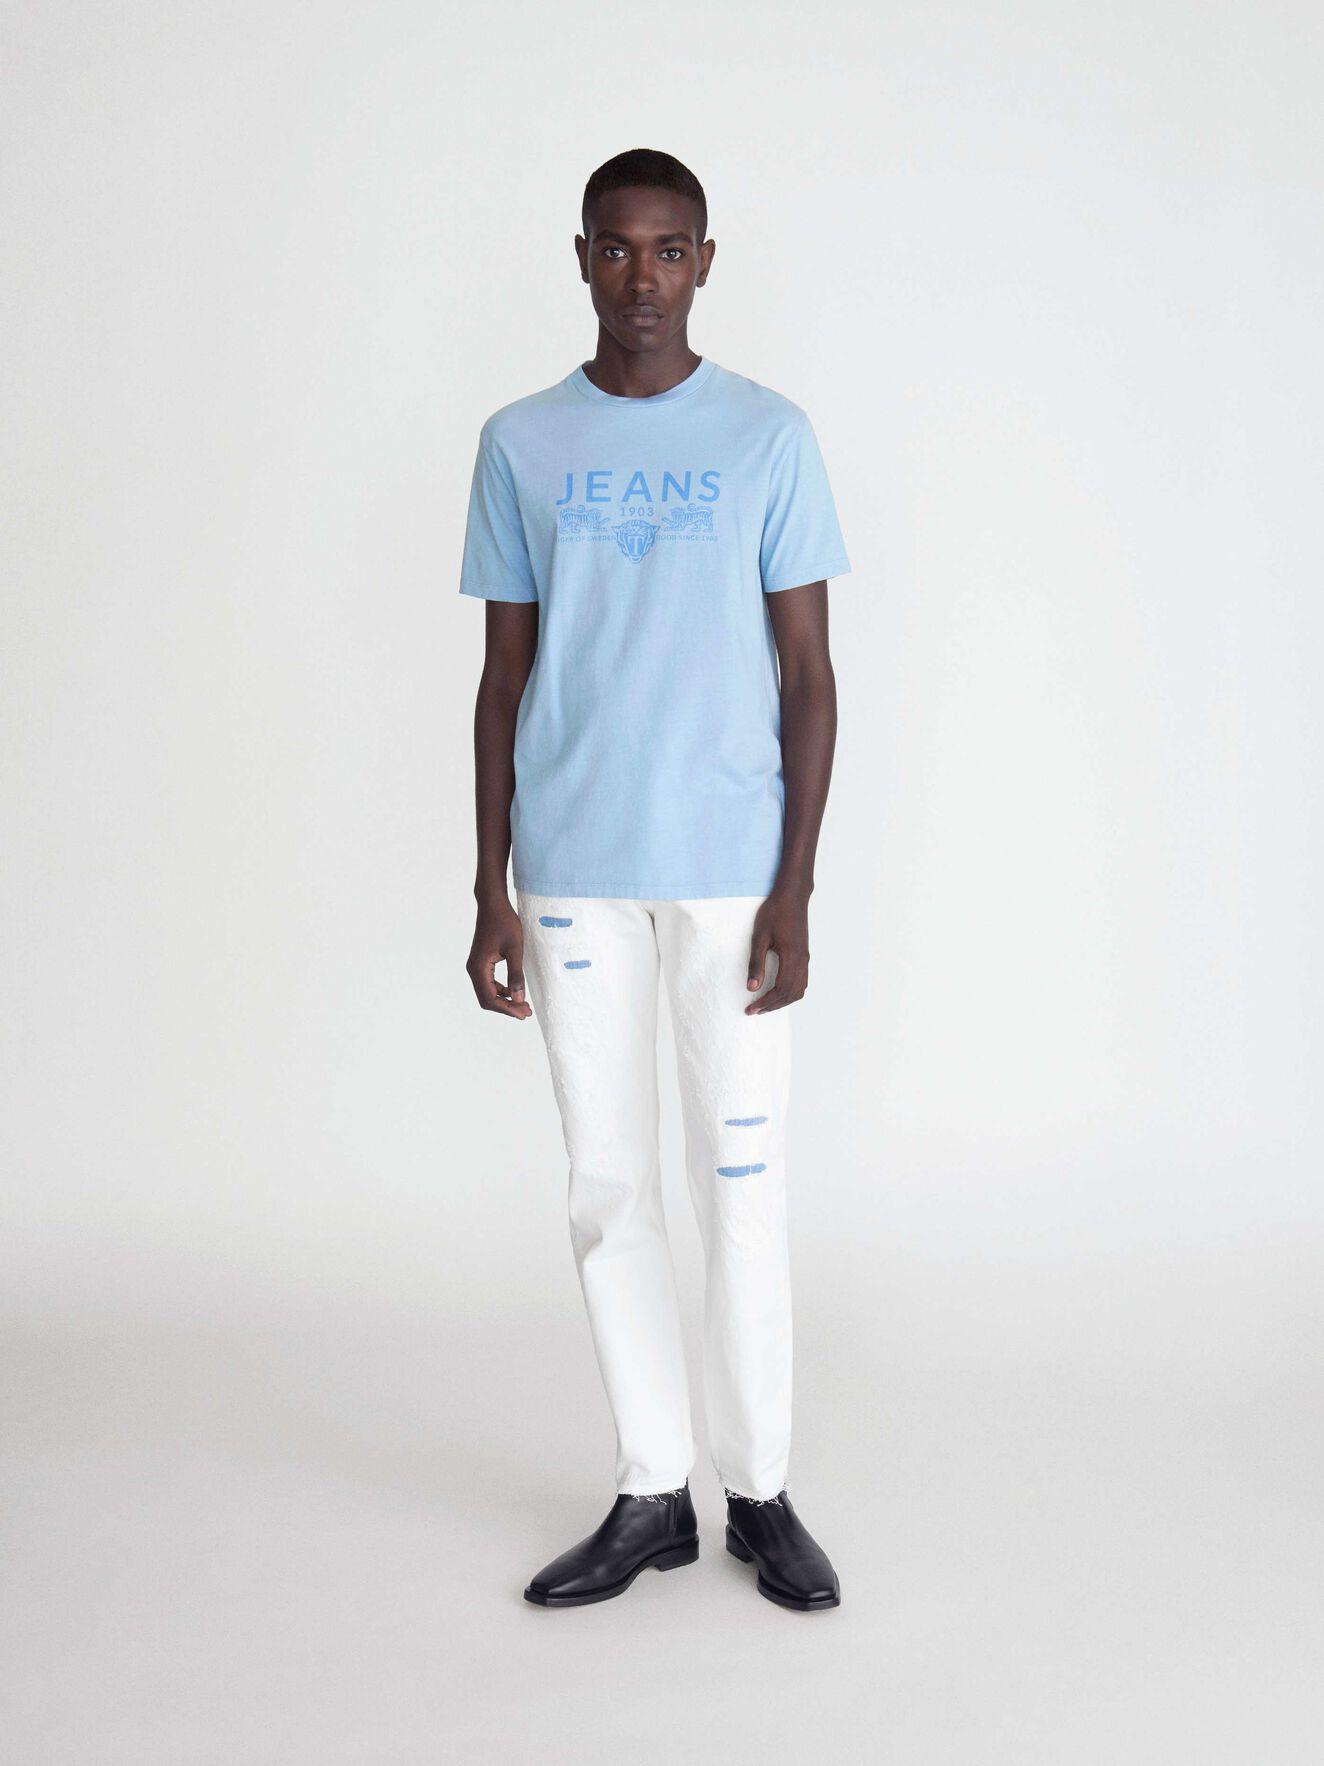 Jeans Buy Designer T Shirts In Tiger Of Swedens Jeans Collection